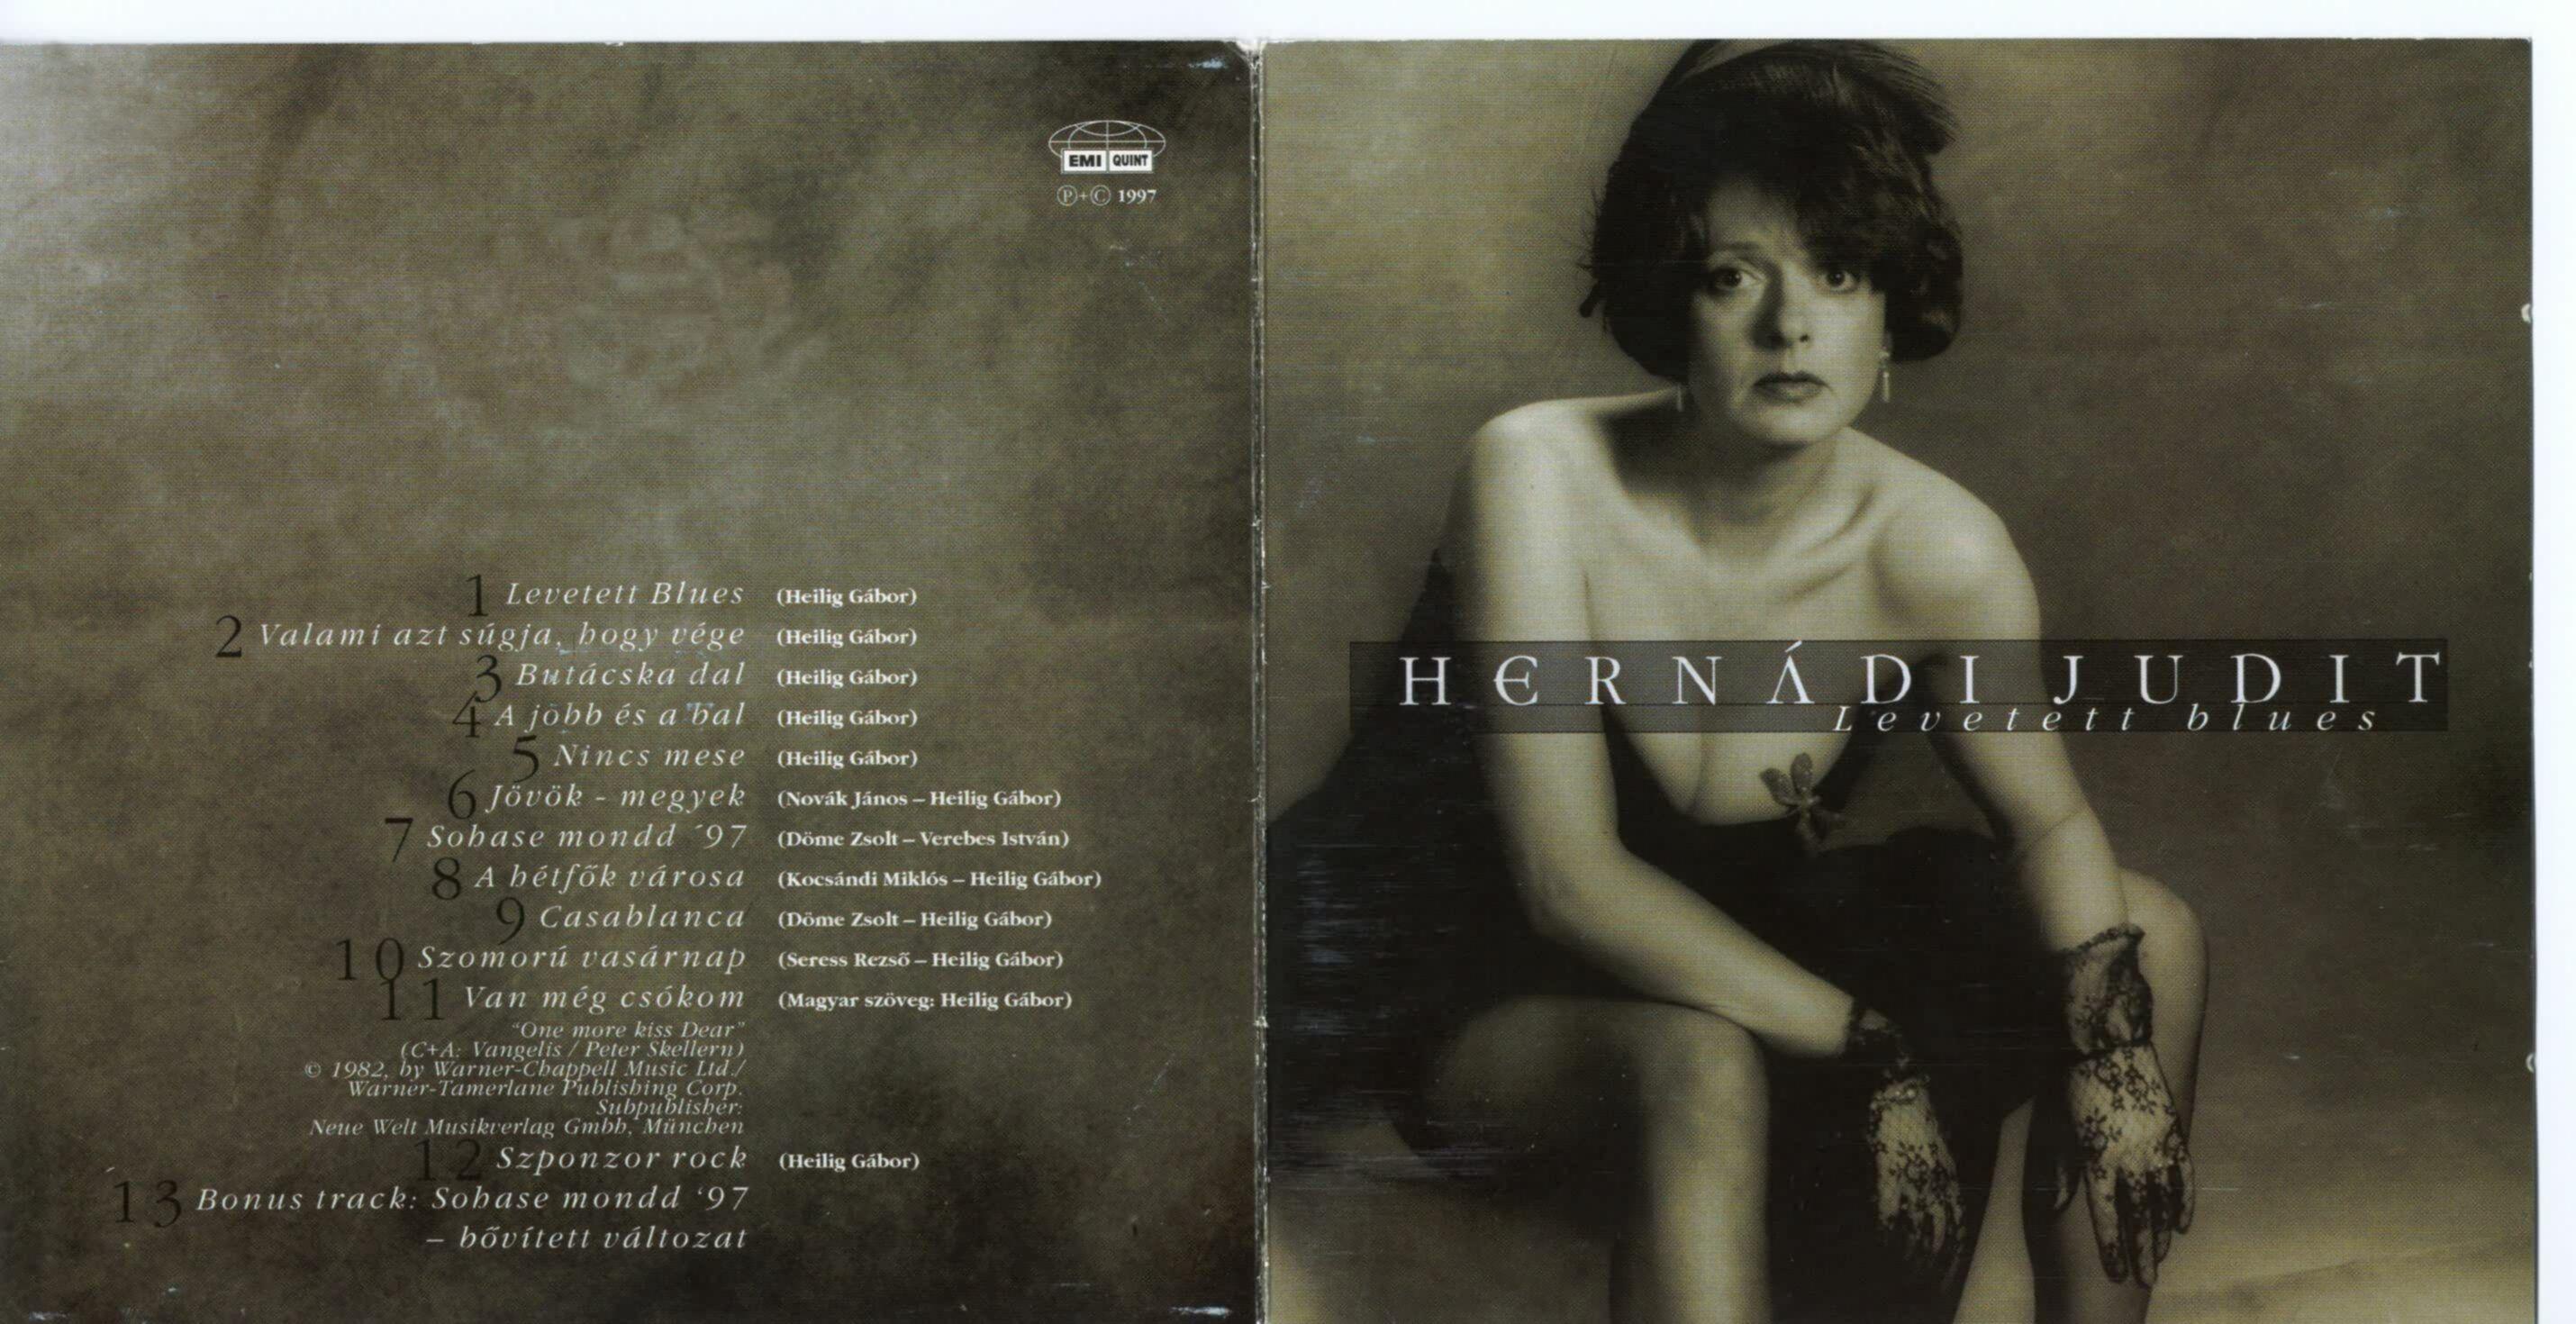 Hernádi Judit Levetett blues